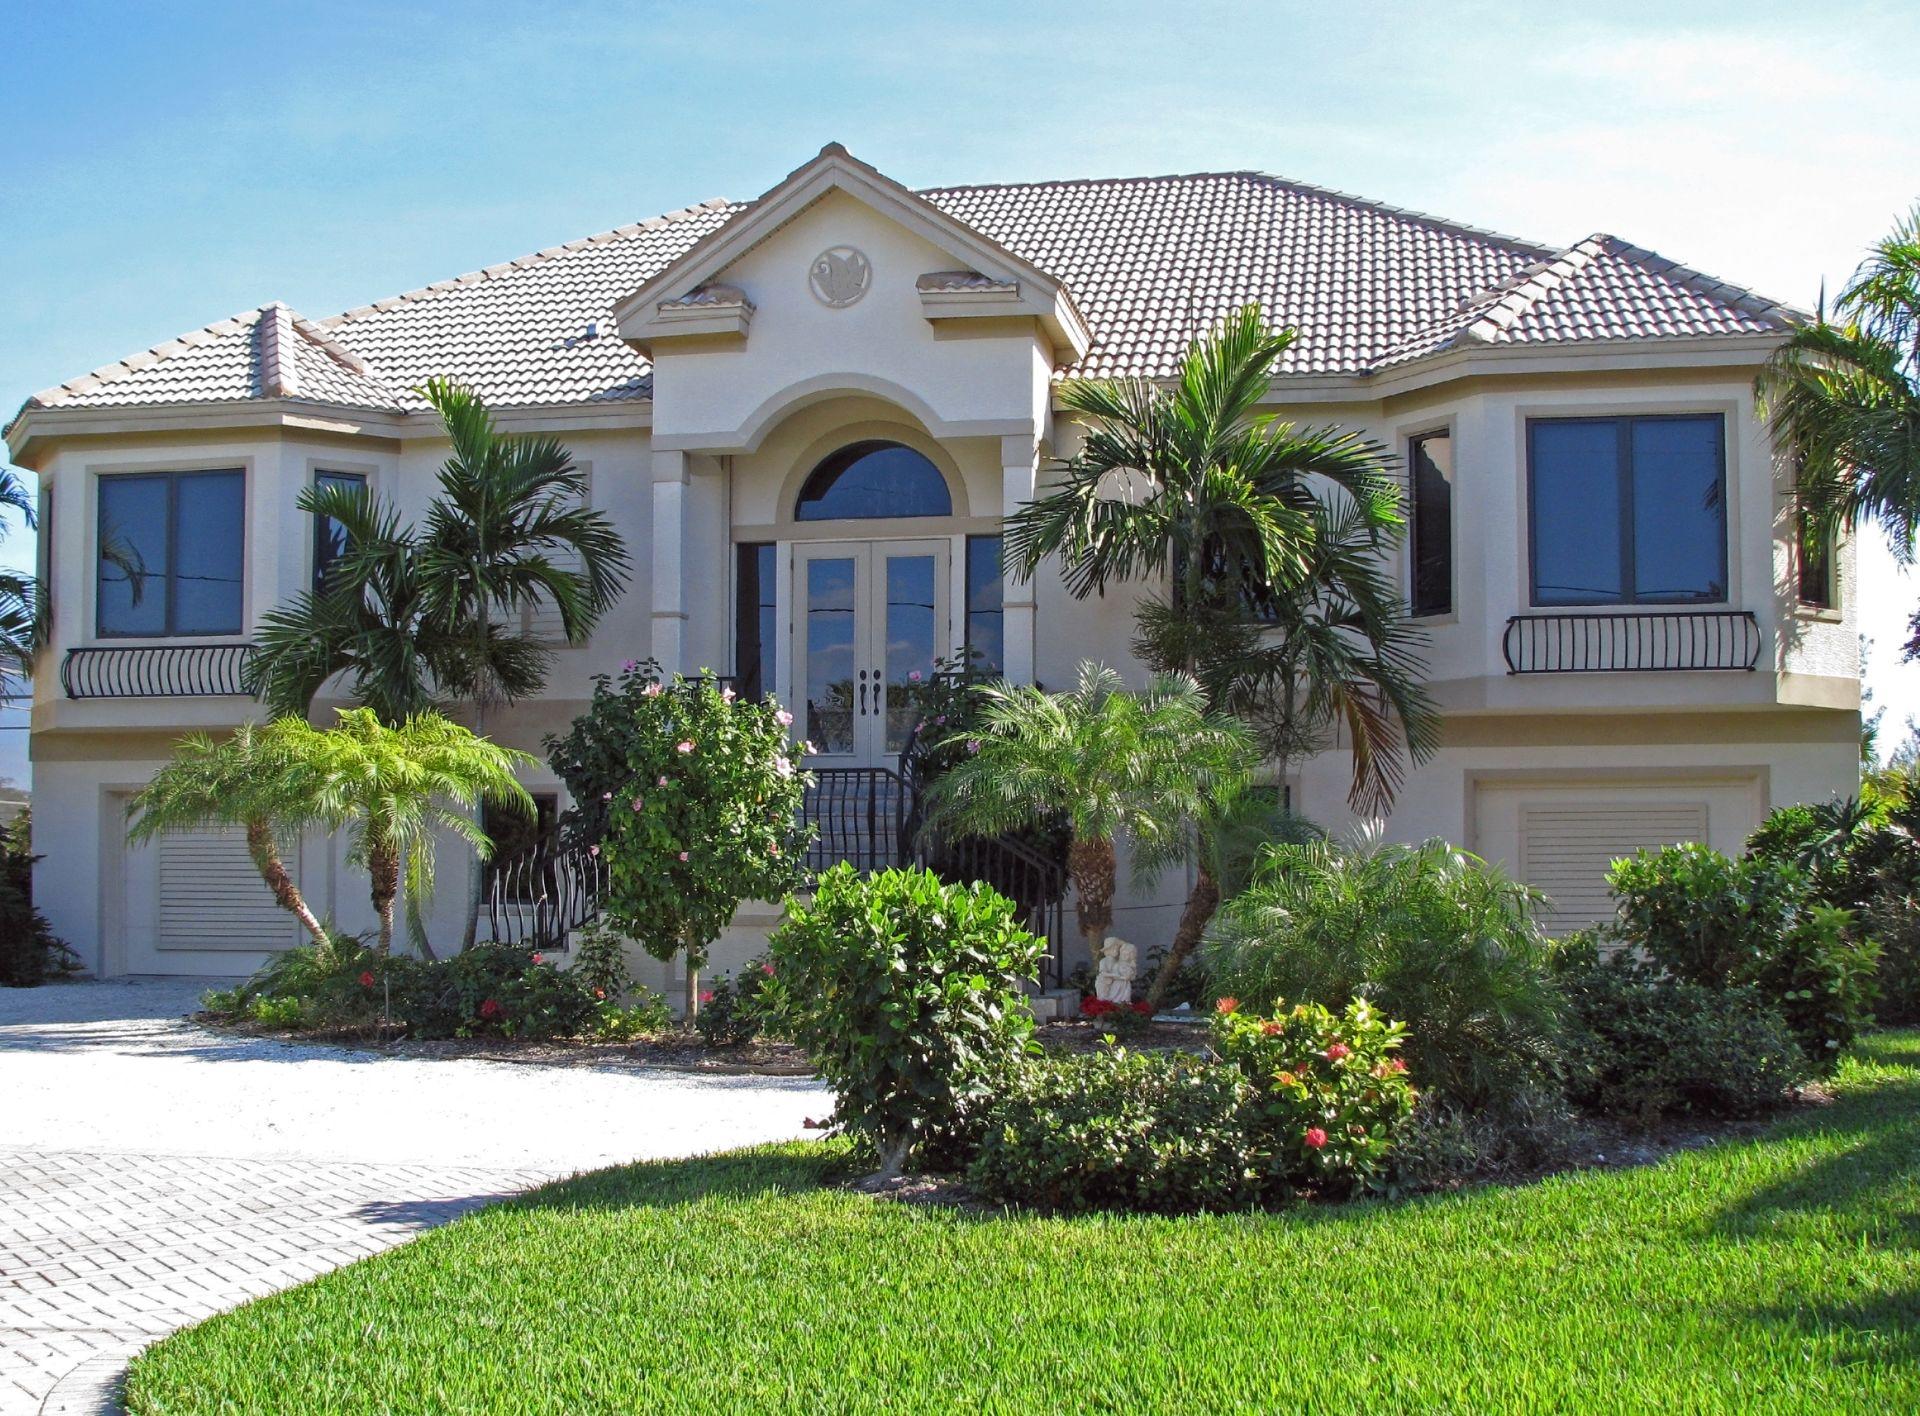 Palm Beach Farms Homes for sale in Boca Raton